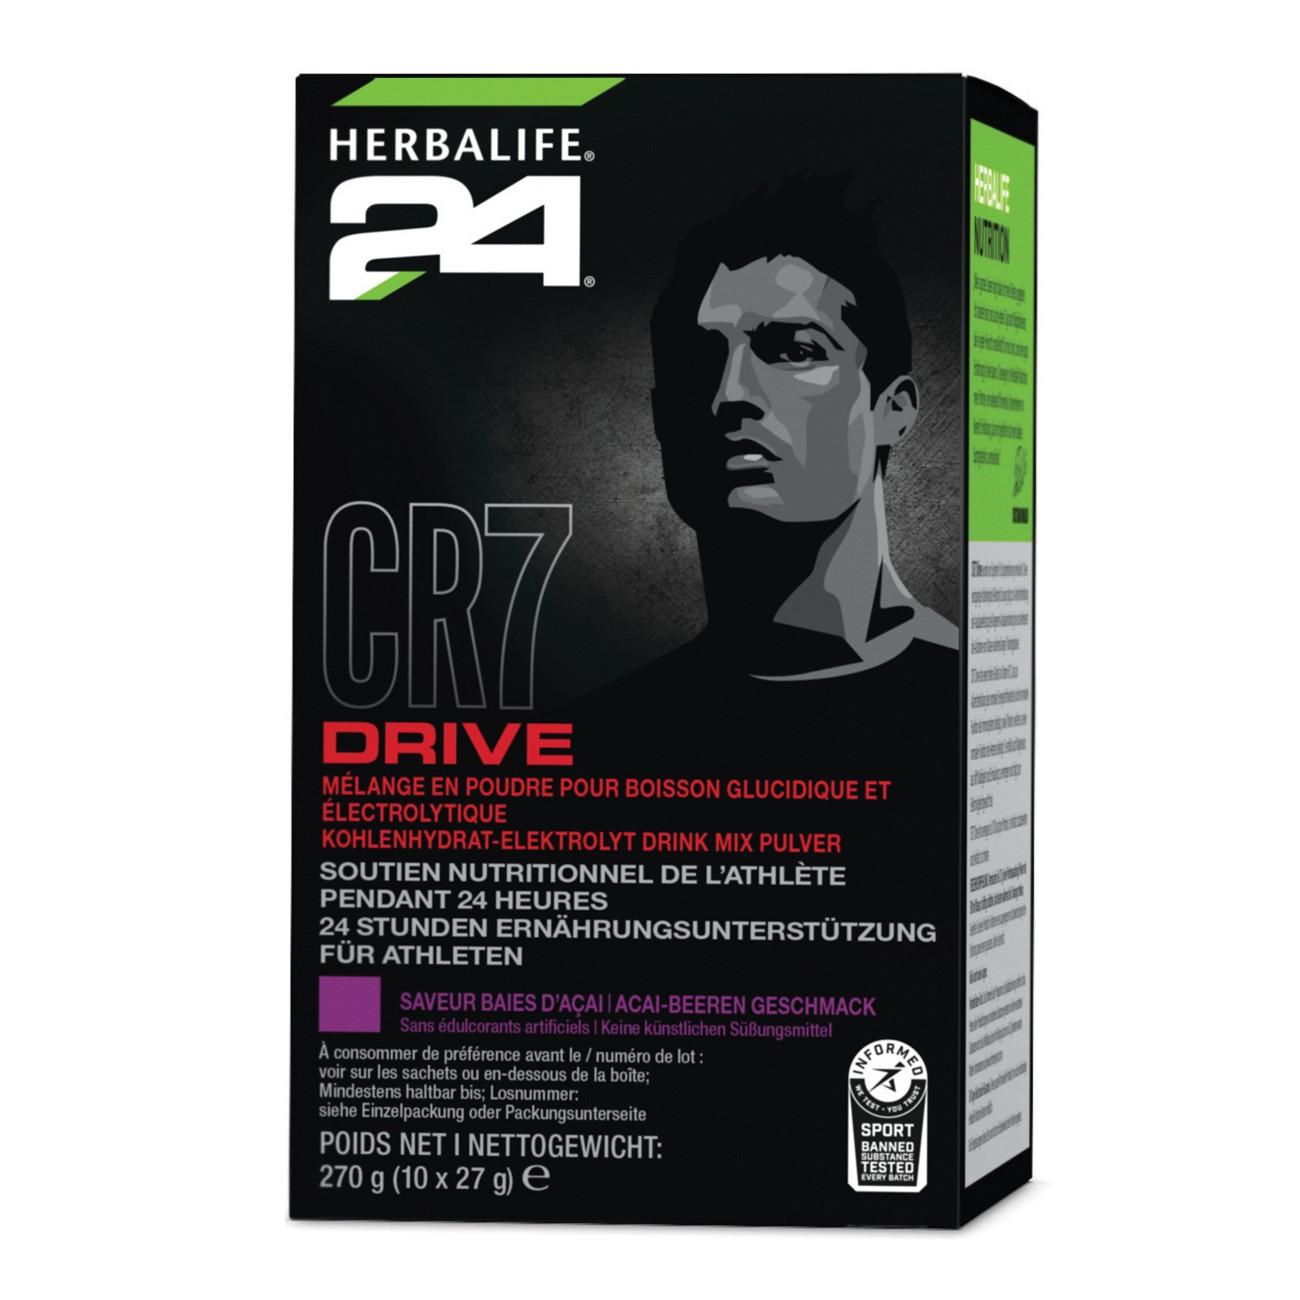 Herbalife CR7 Drive Portionspackungen (10 Portionen)